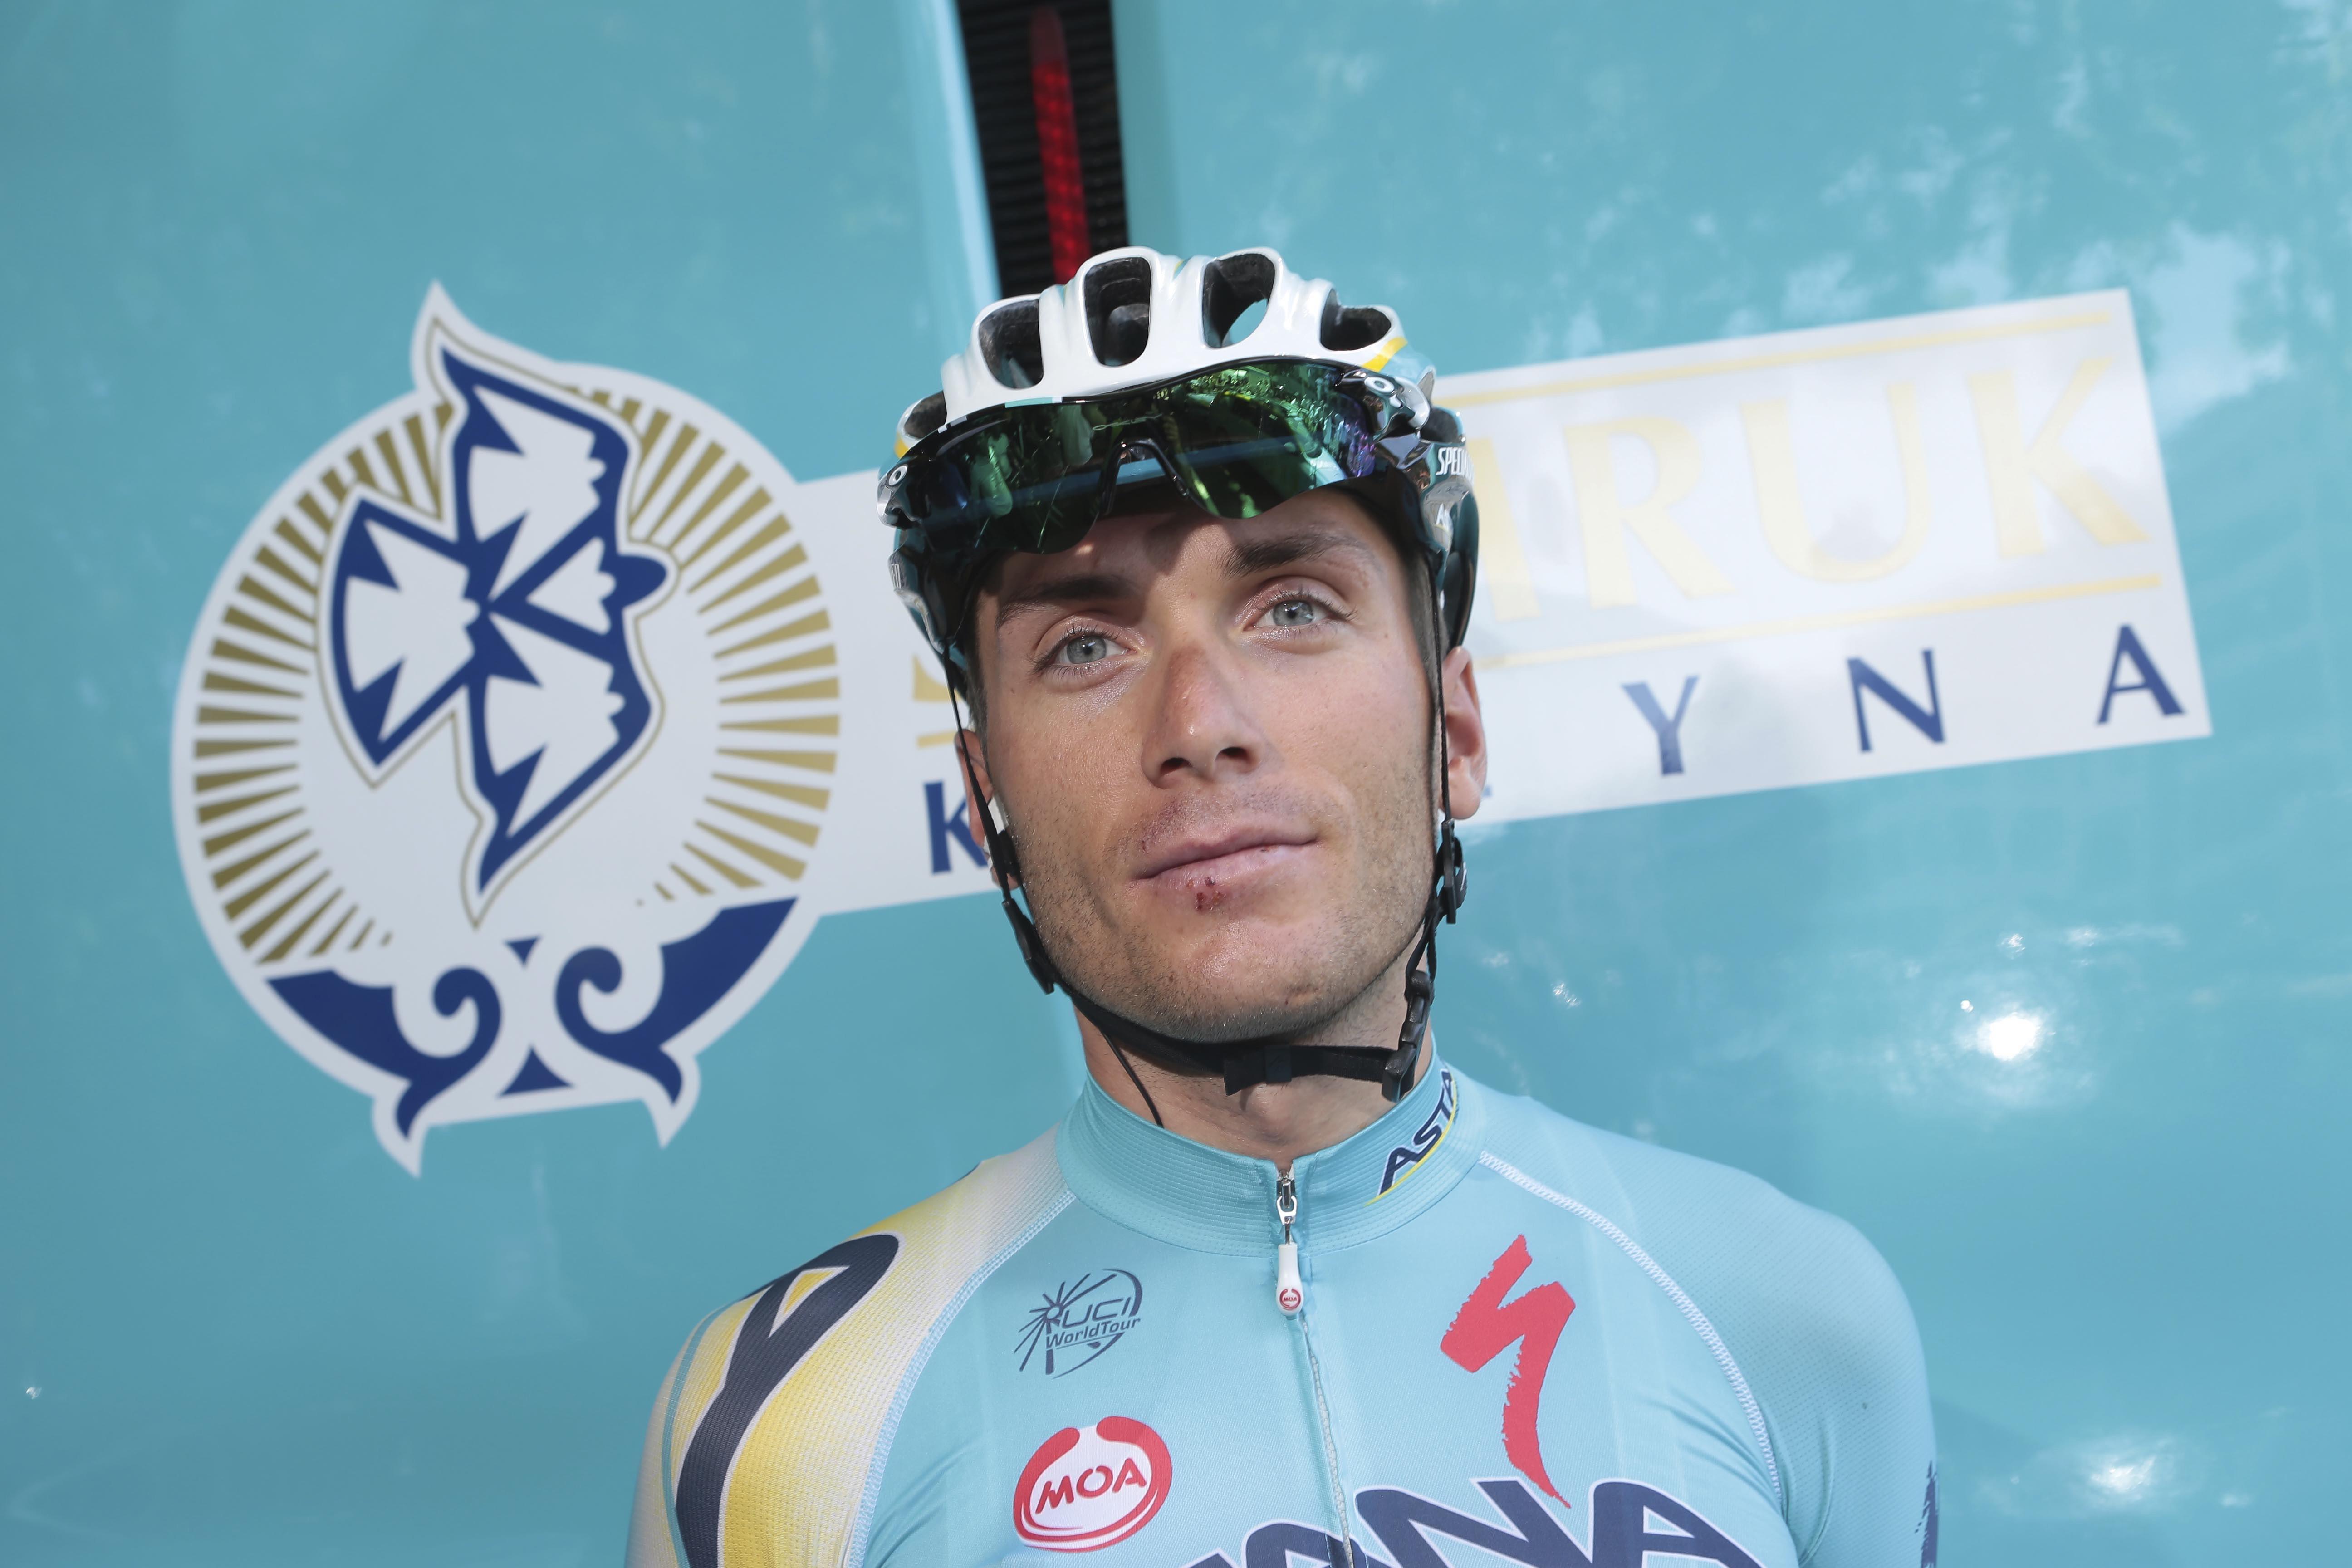 CYCLISME - TOUR DE FRANCE 2014 - 2014 grivko (andriy) - (ukr) - L'(20/07/2014)